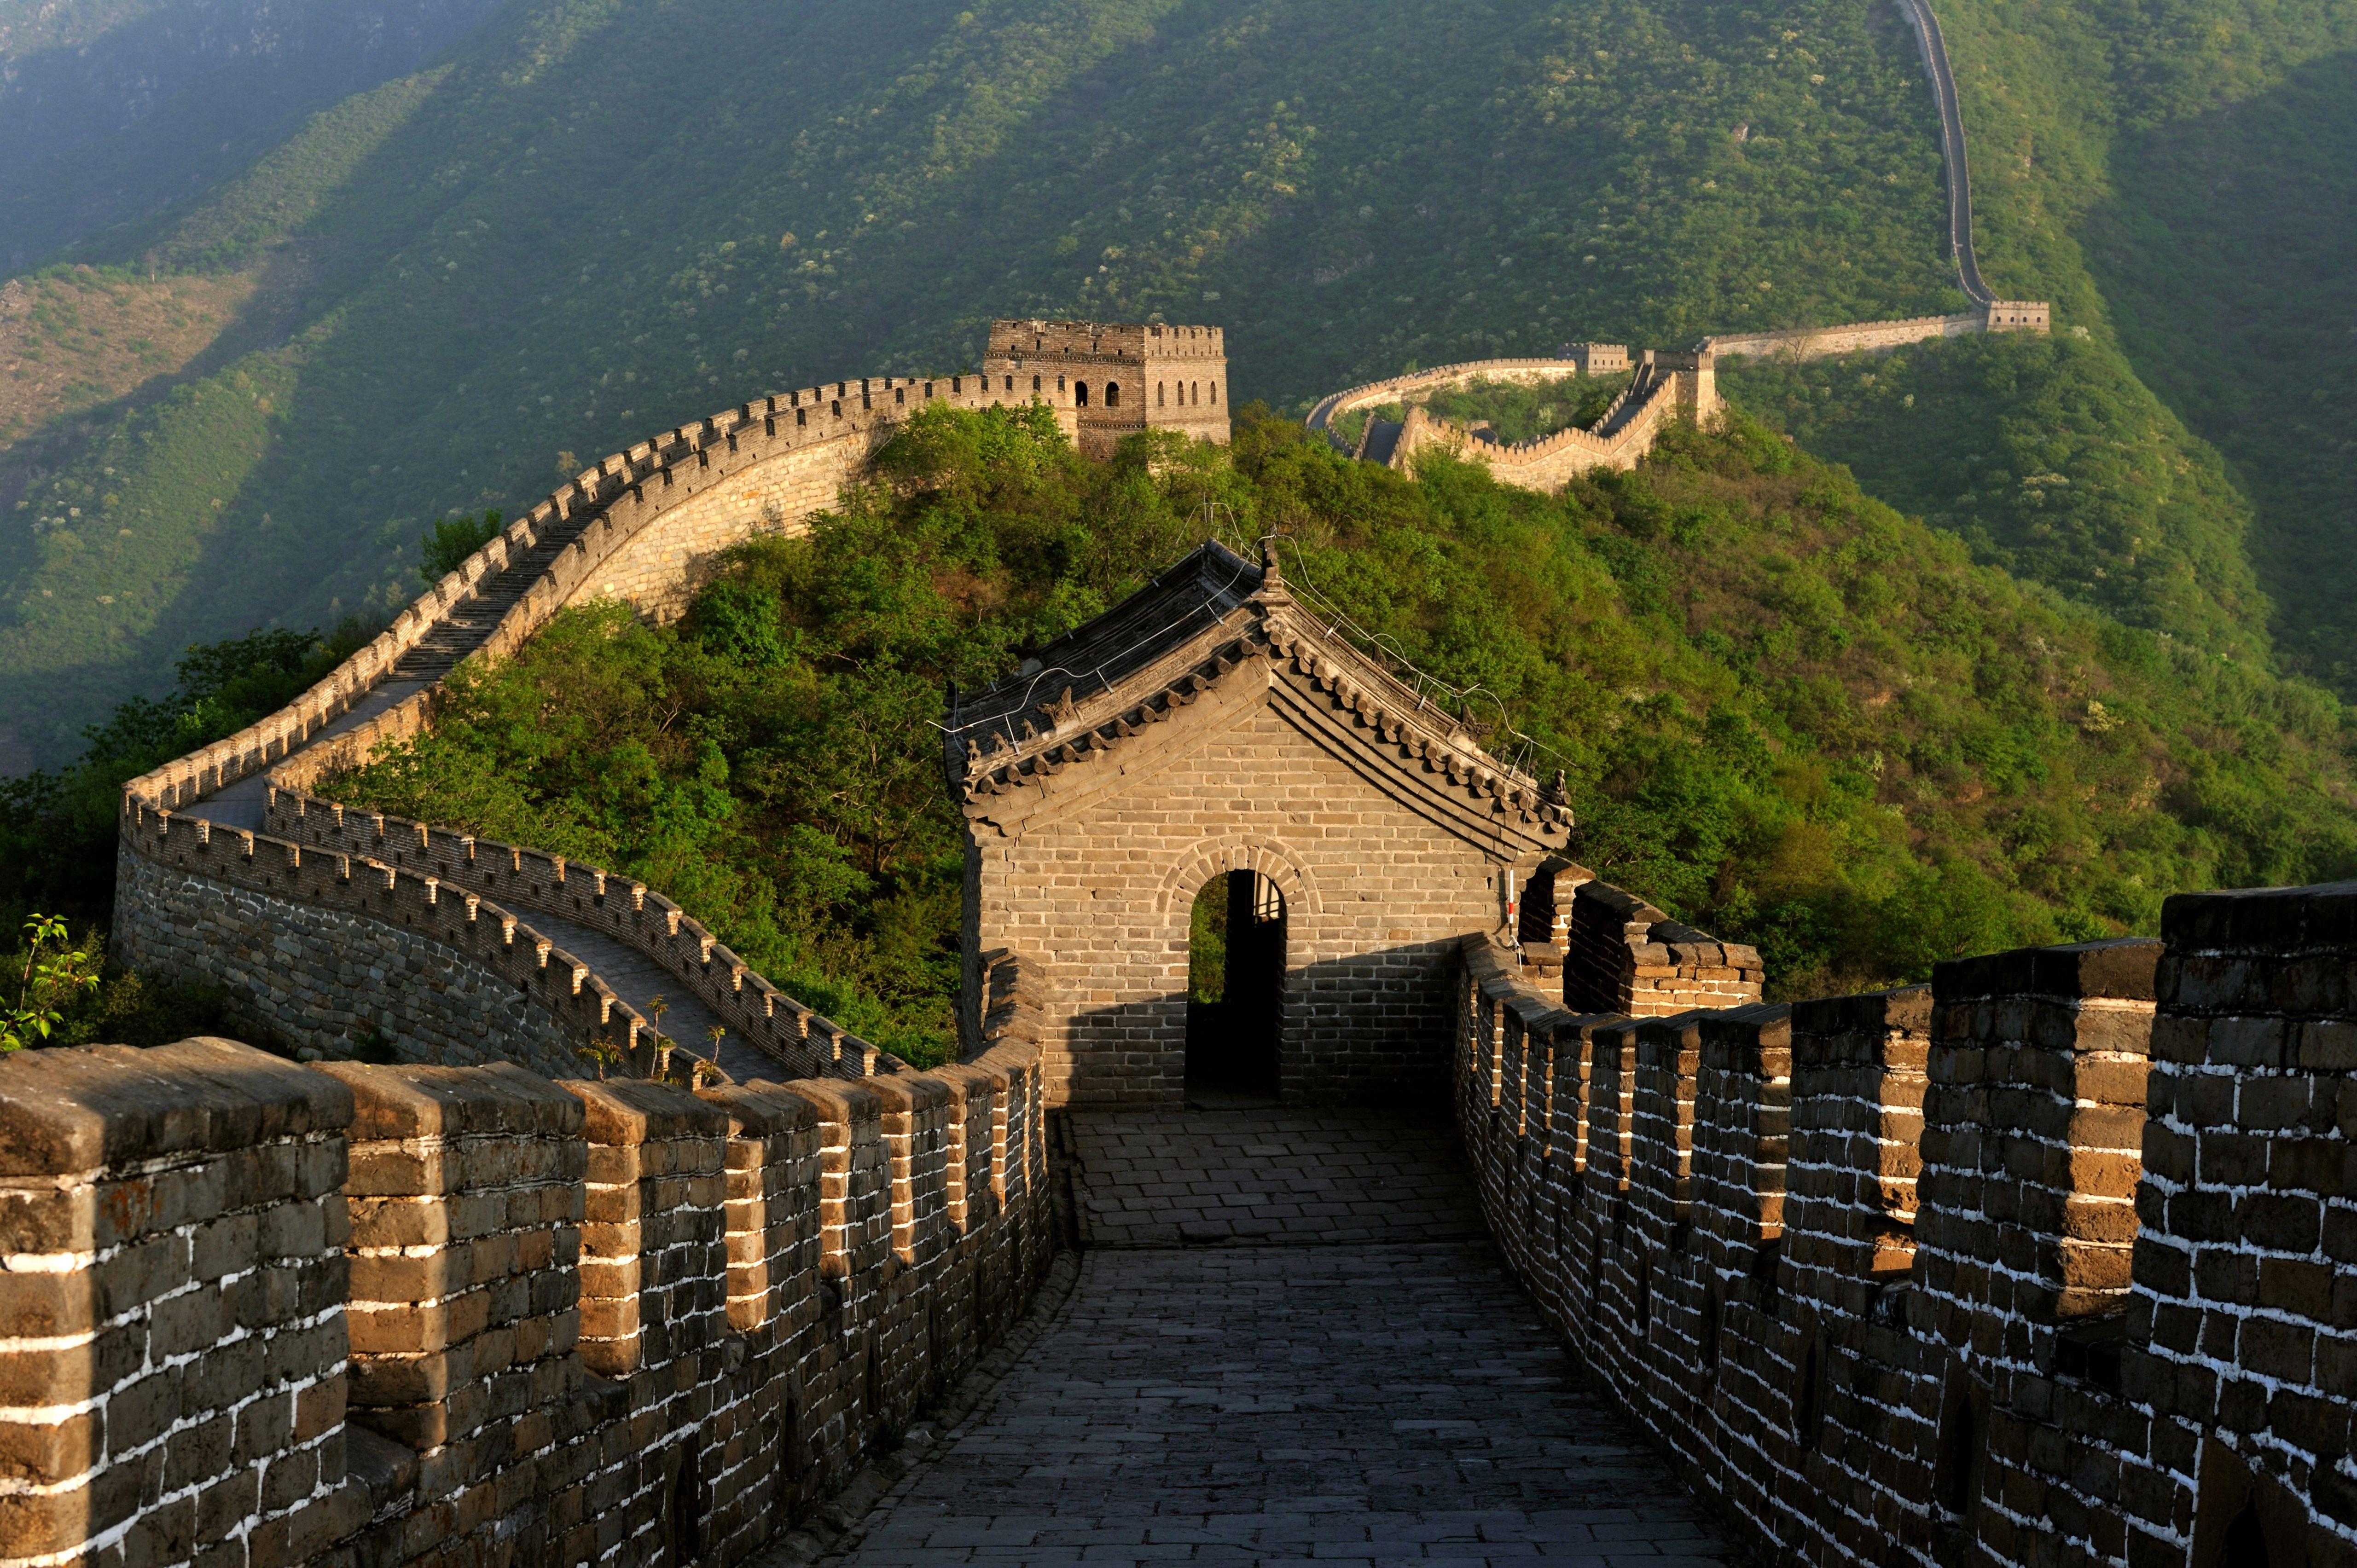 China, near Beijing, Great Wall of China , Mutianyu section